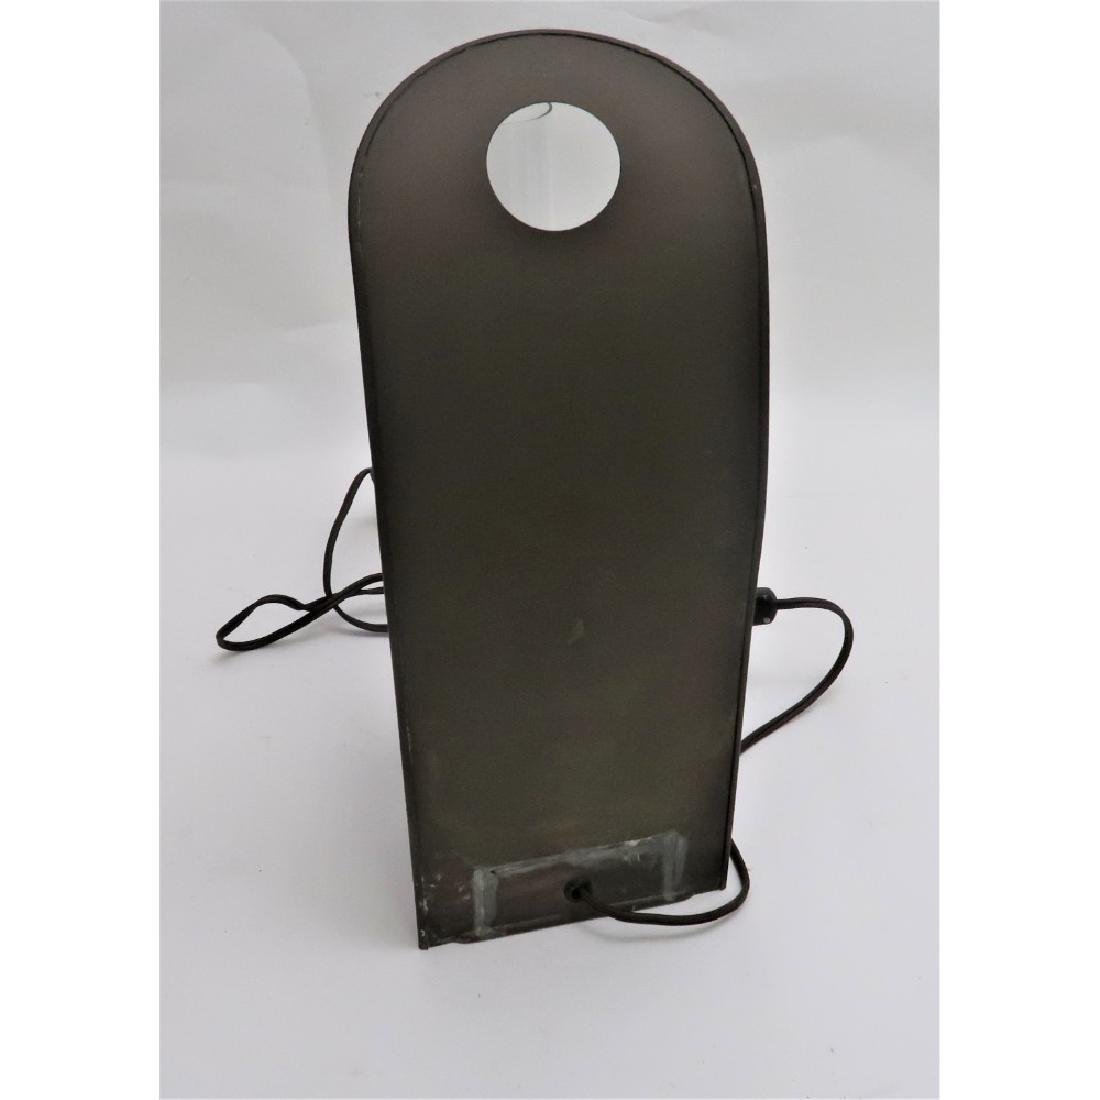 Old Brass Lantern - Electrified - Glass shade is wavy - 4